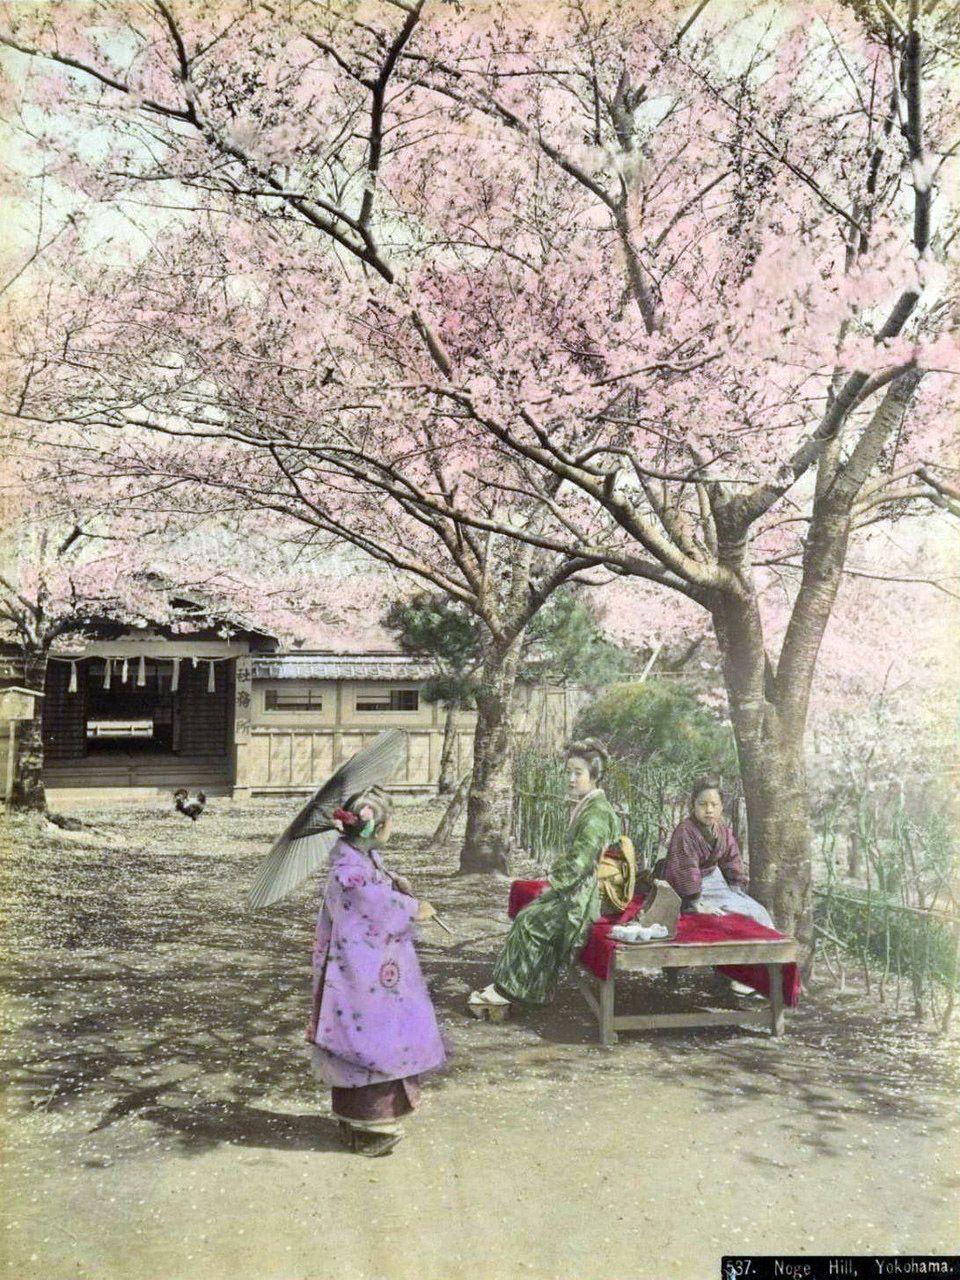 Kusakabe Kimbei 日下部 金兵衛 (1841-1934) Noge hill, Yokohama - Hand-colored albumen print - Japan - 1880s Nippon-Graph